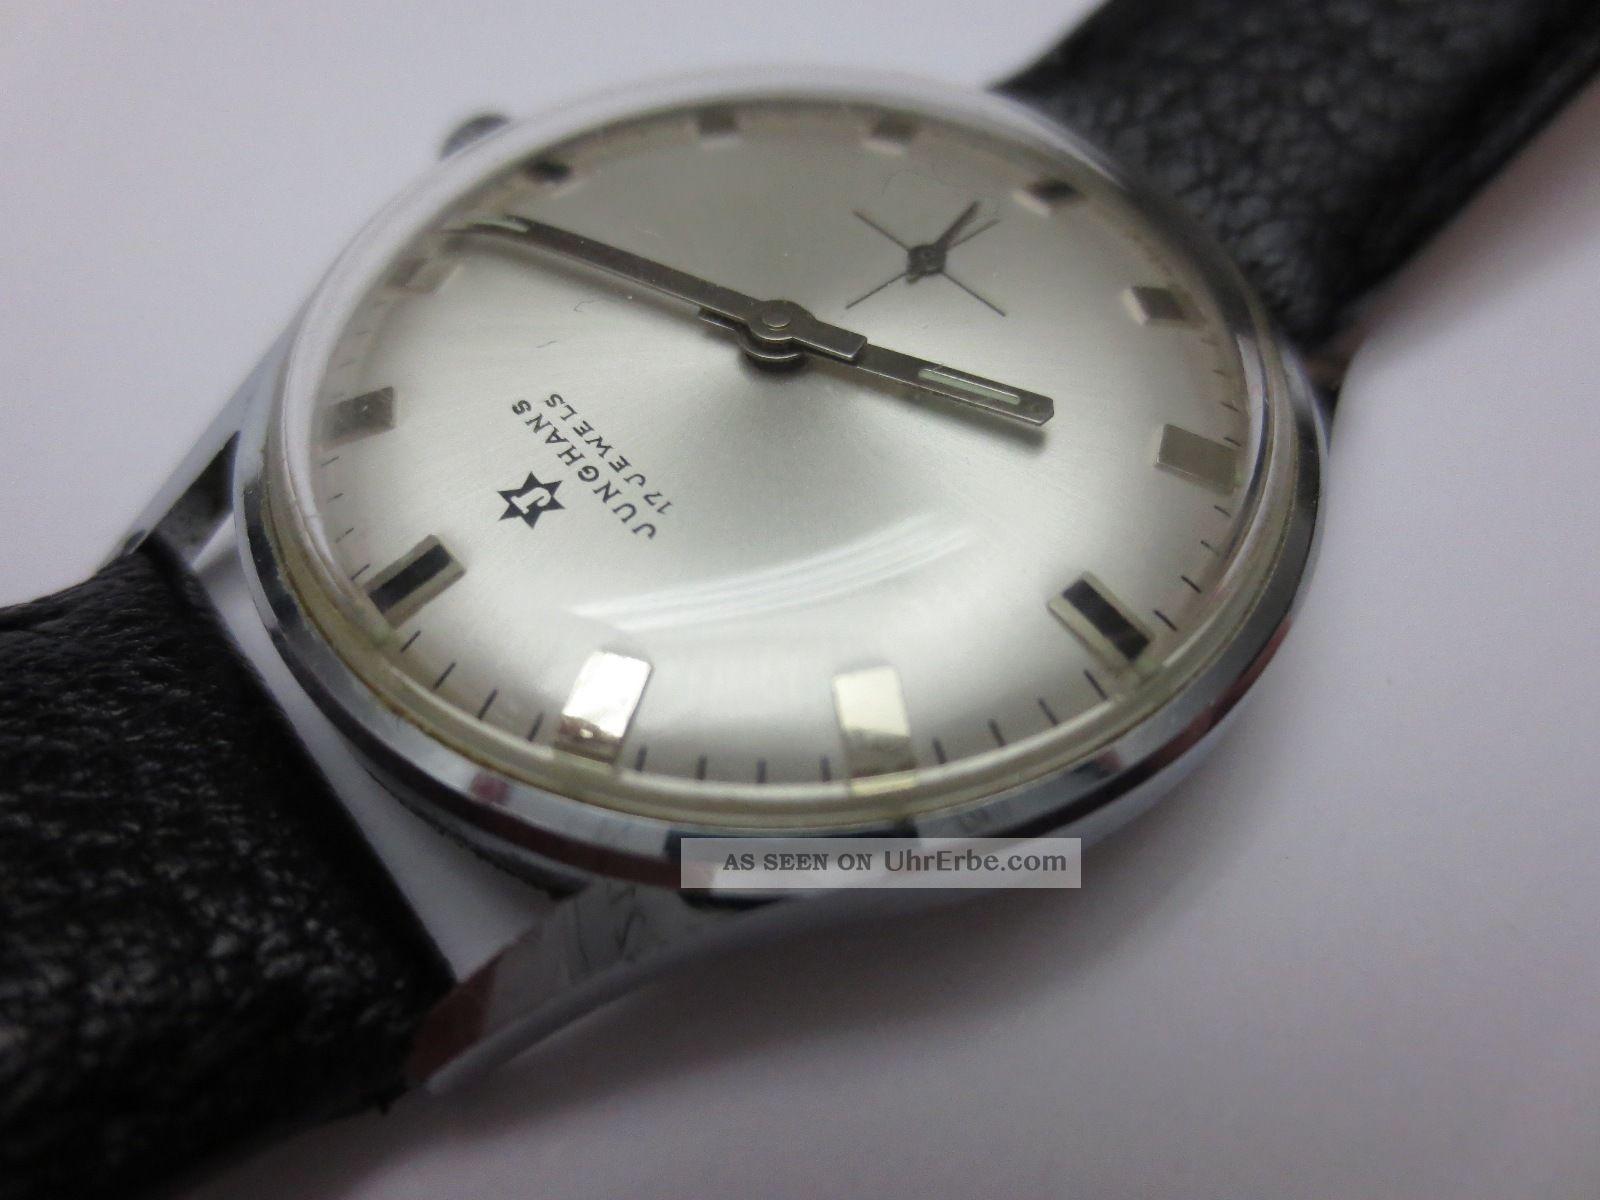 Eleganter Schick Der 60er: Junghans Vintage - Armbanduhr Armbanduhren Bild